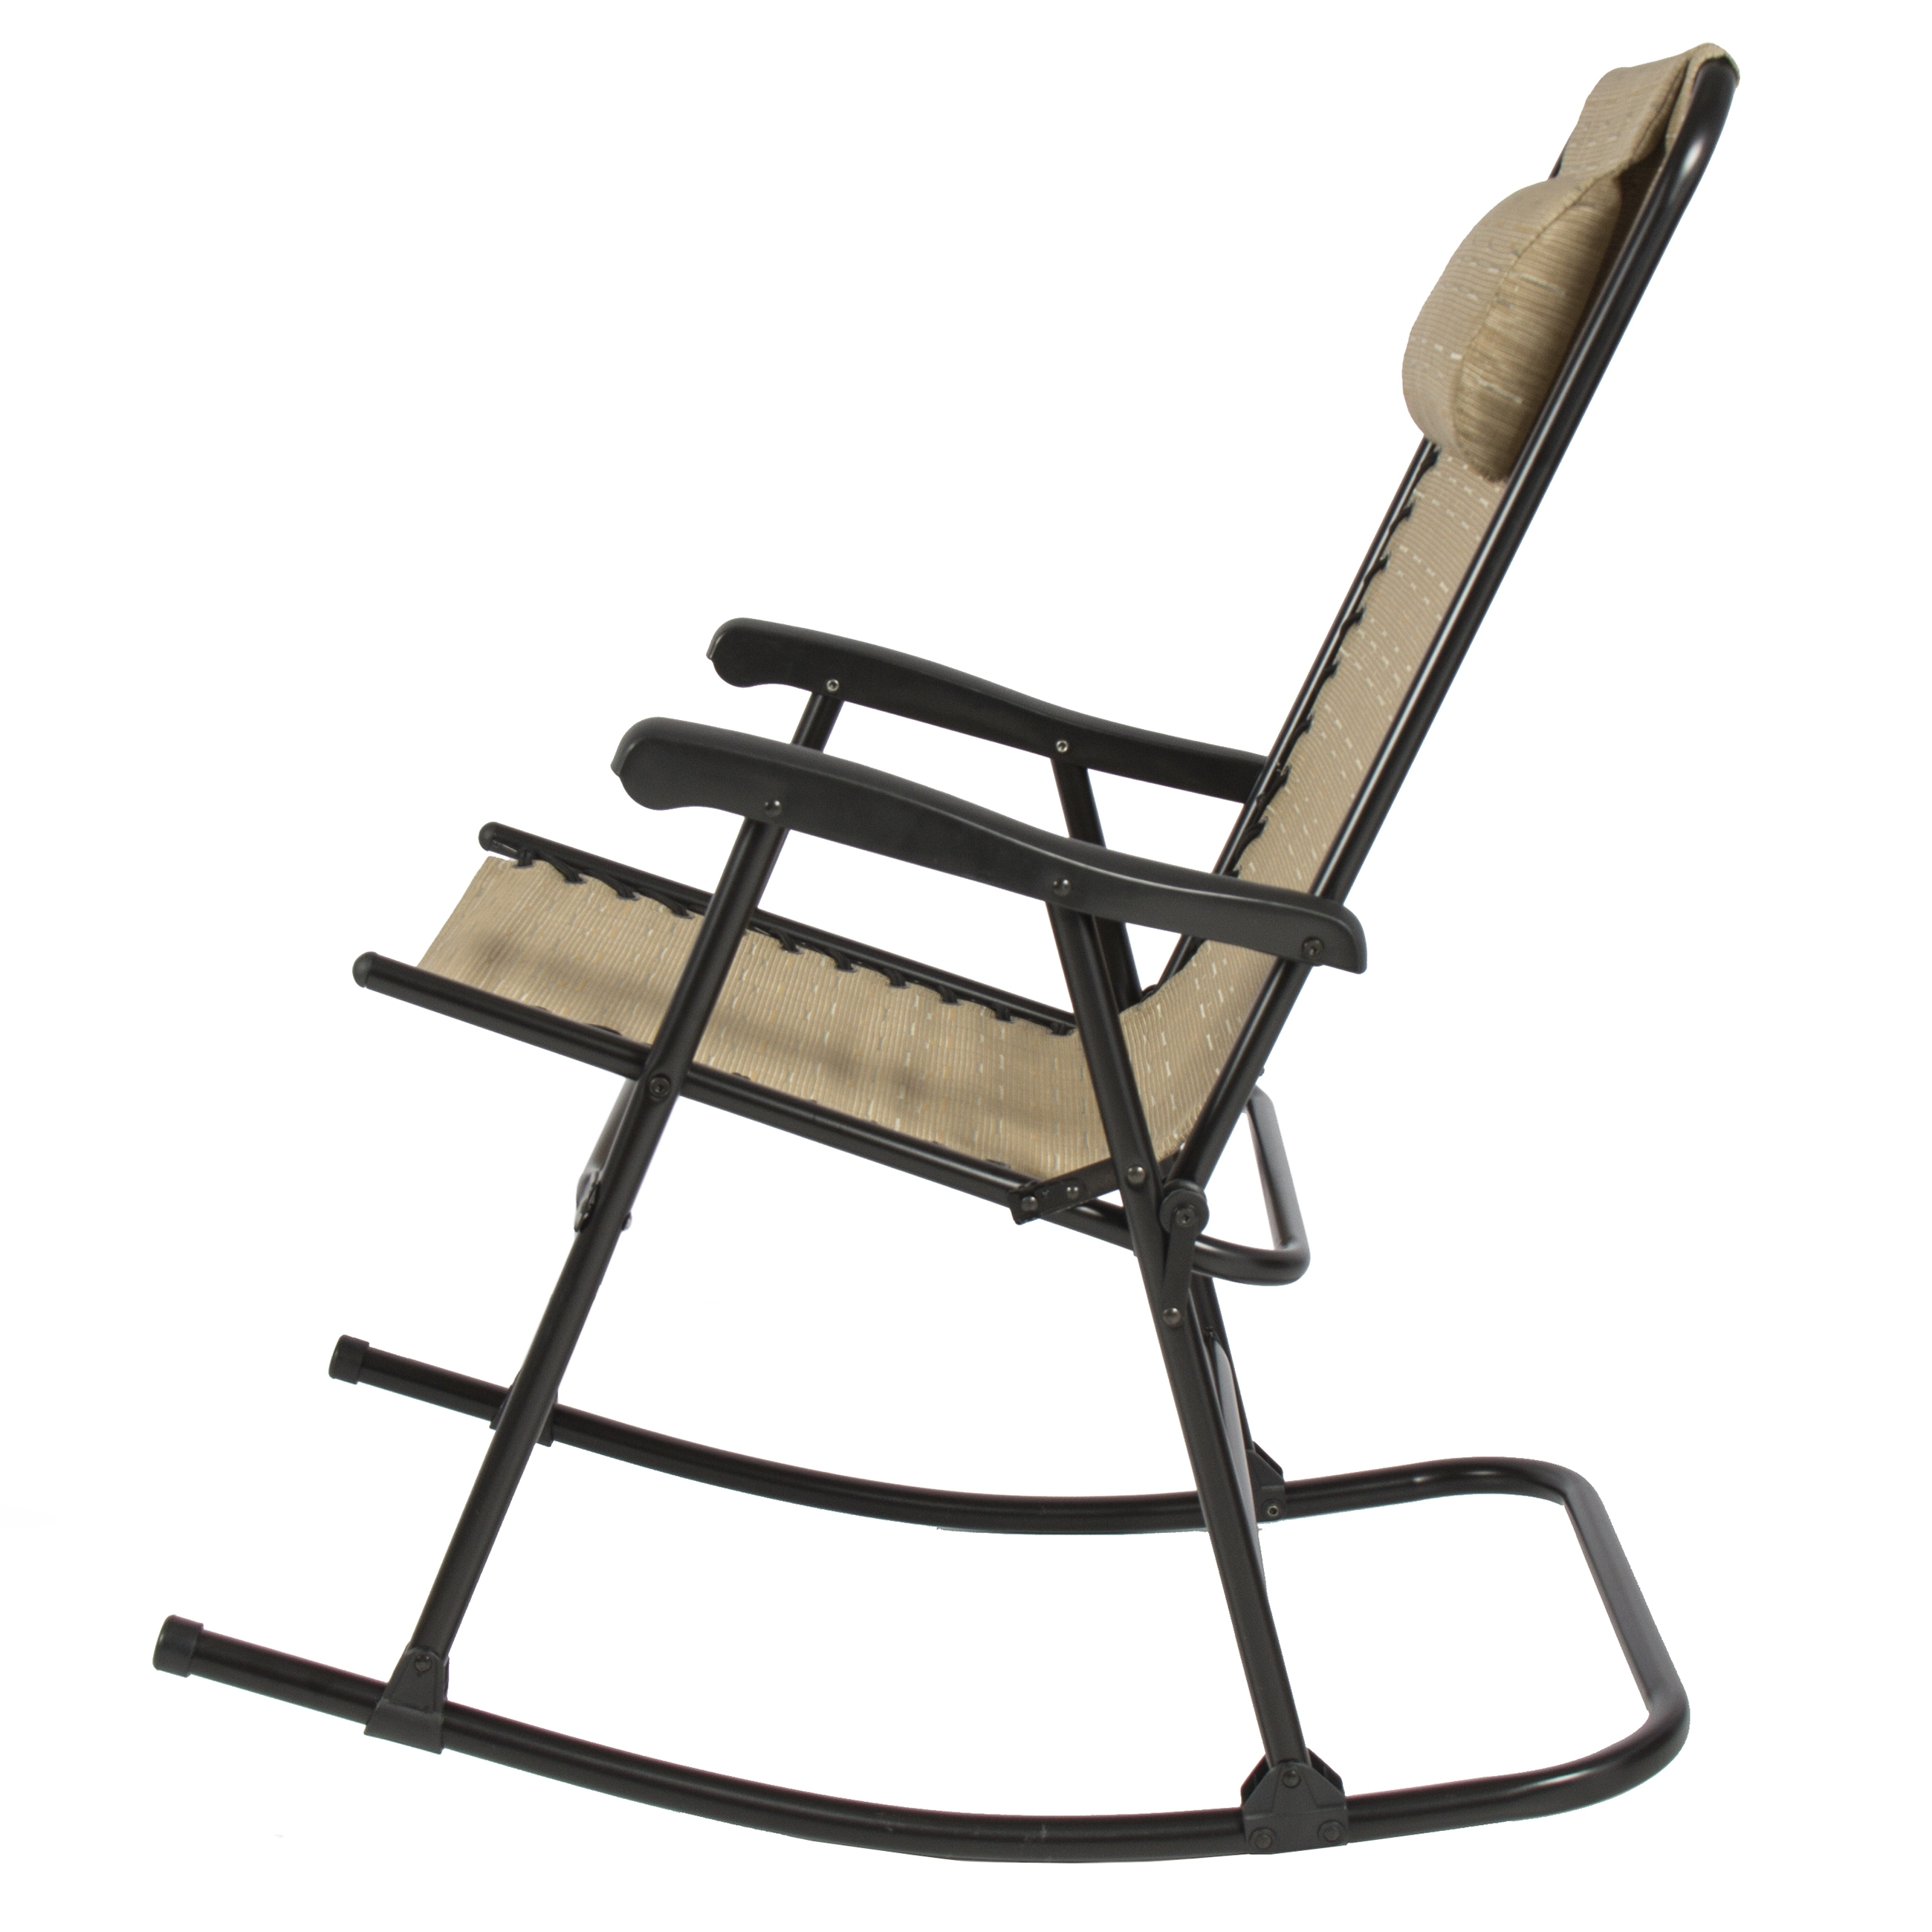 Popular Manhattan Patio Rocking Chair Grey Rona With Regard To Manhattan Patio Grey Rocking Chairs (View 12 of 20)